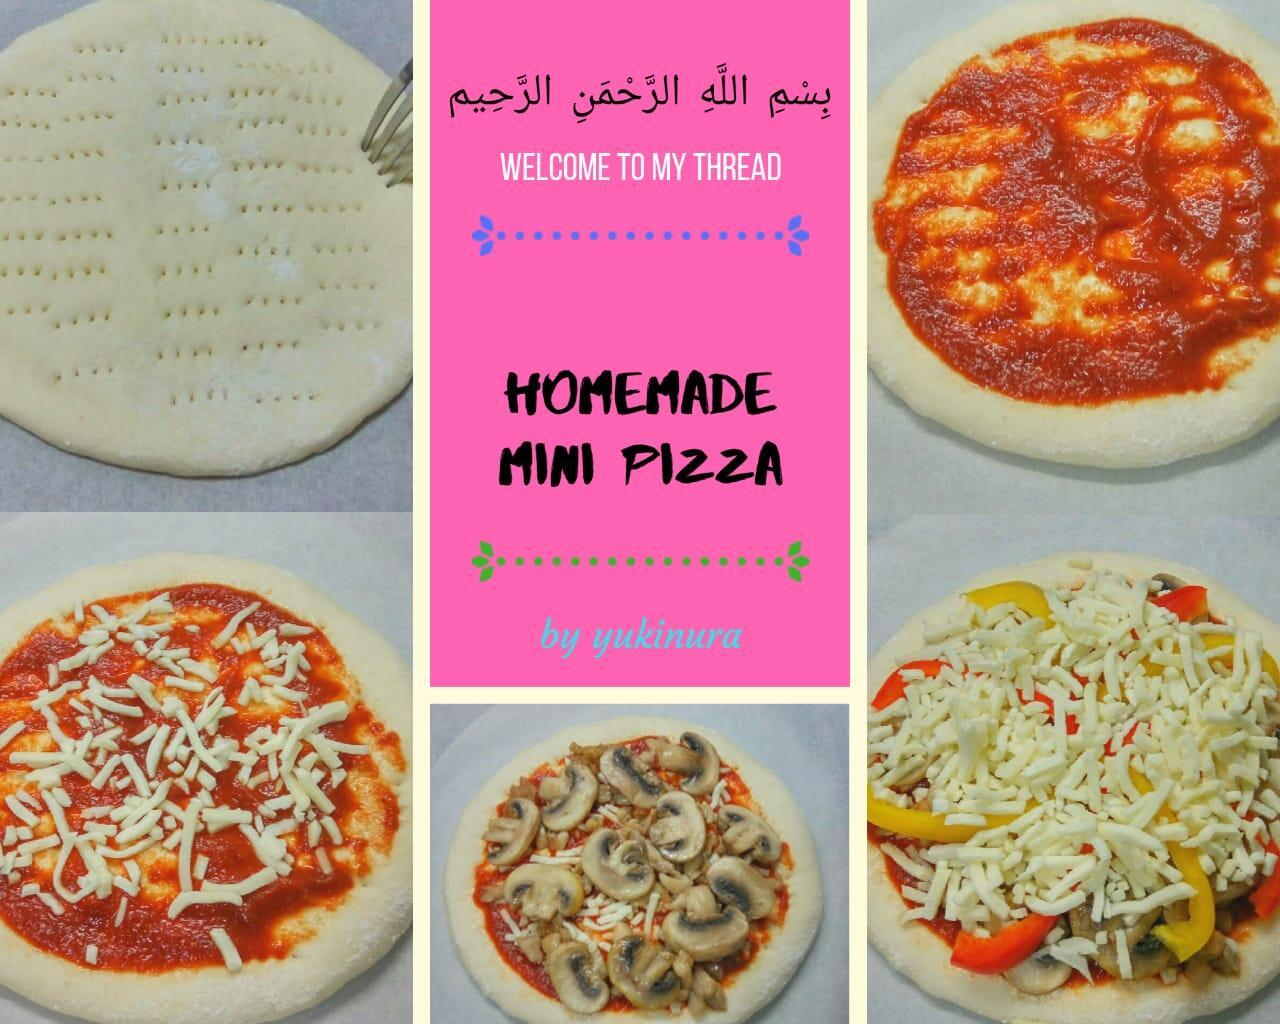 Homemade Mini Pizza Paling Enak By Yukinura, Nggak Percaya? Silahkan Dicoba!!